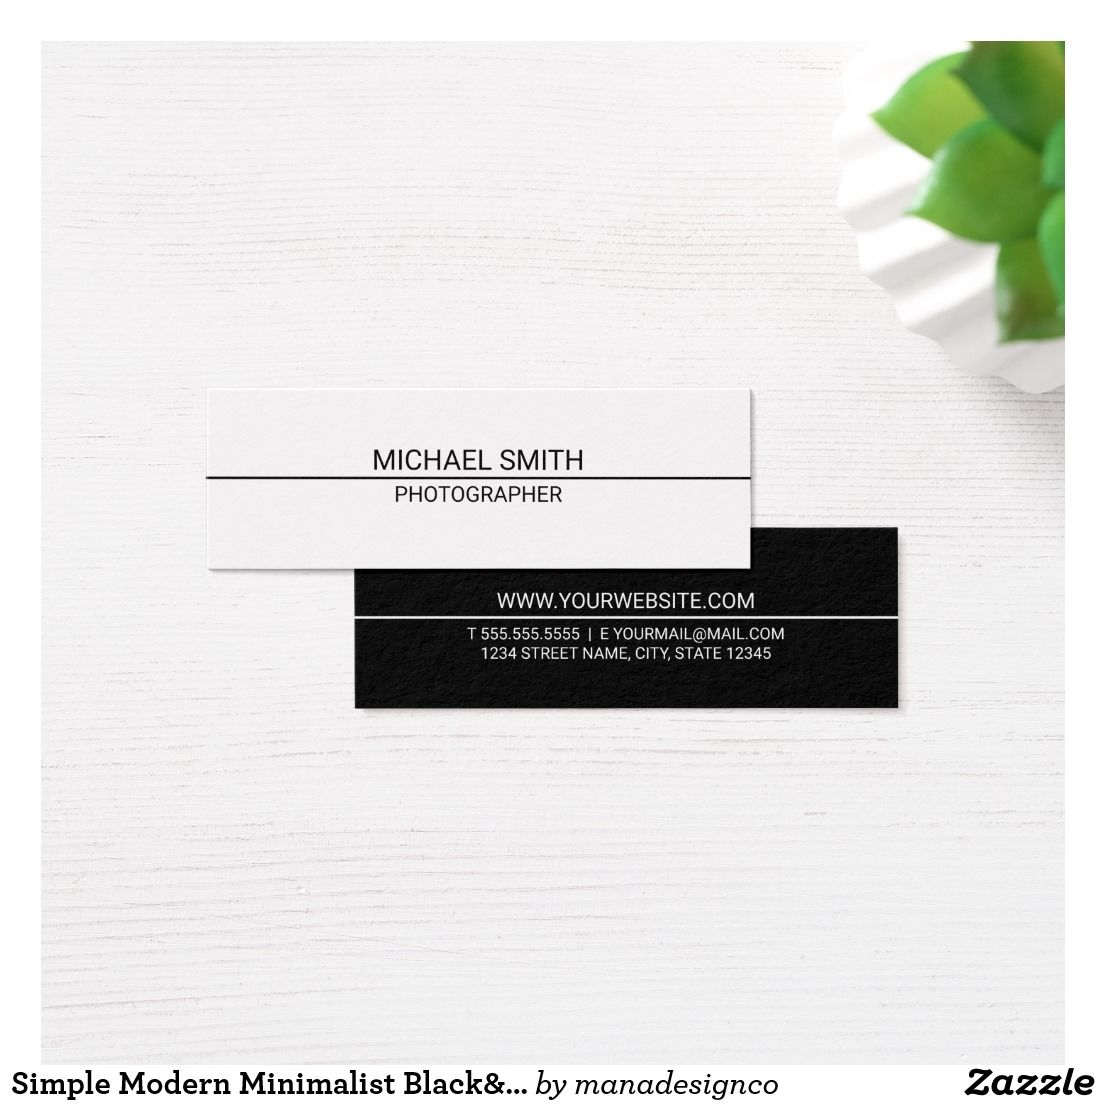 Simple Modern Minimalist Black&White Mini Business Card   Stylists ...